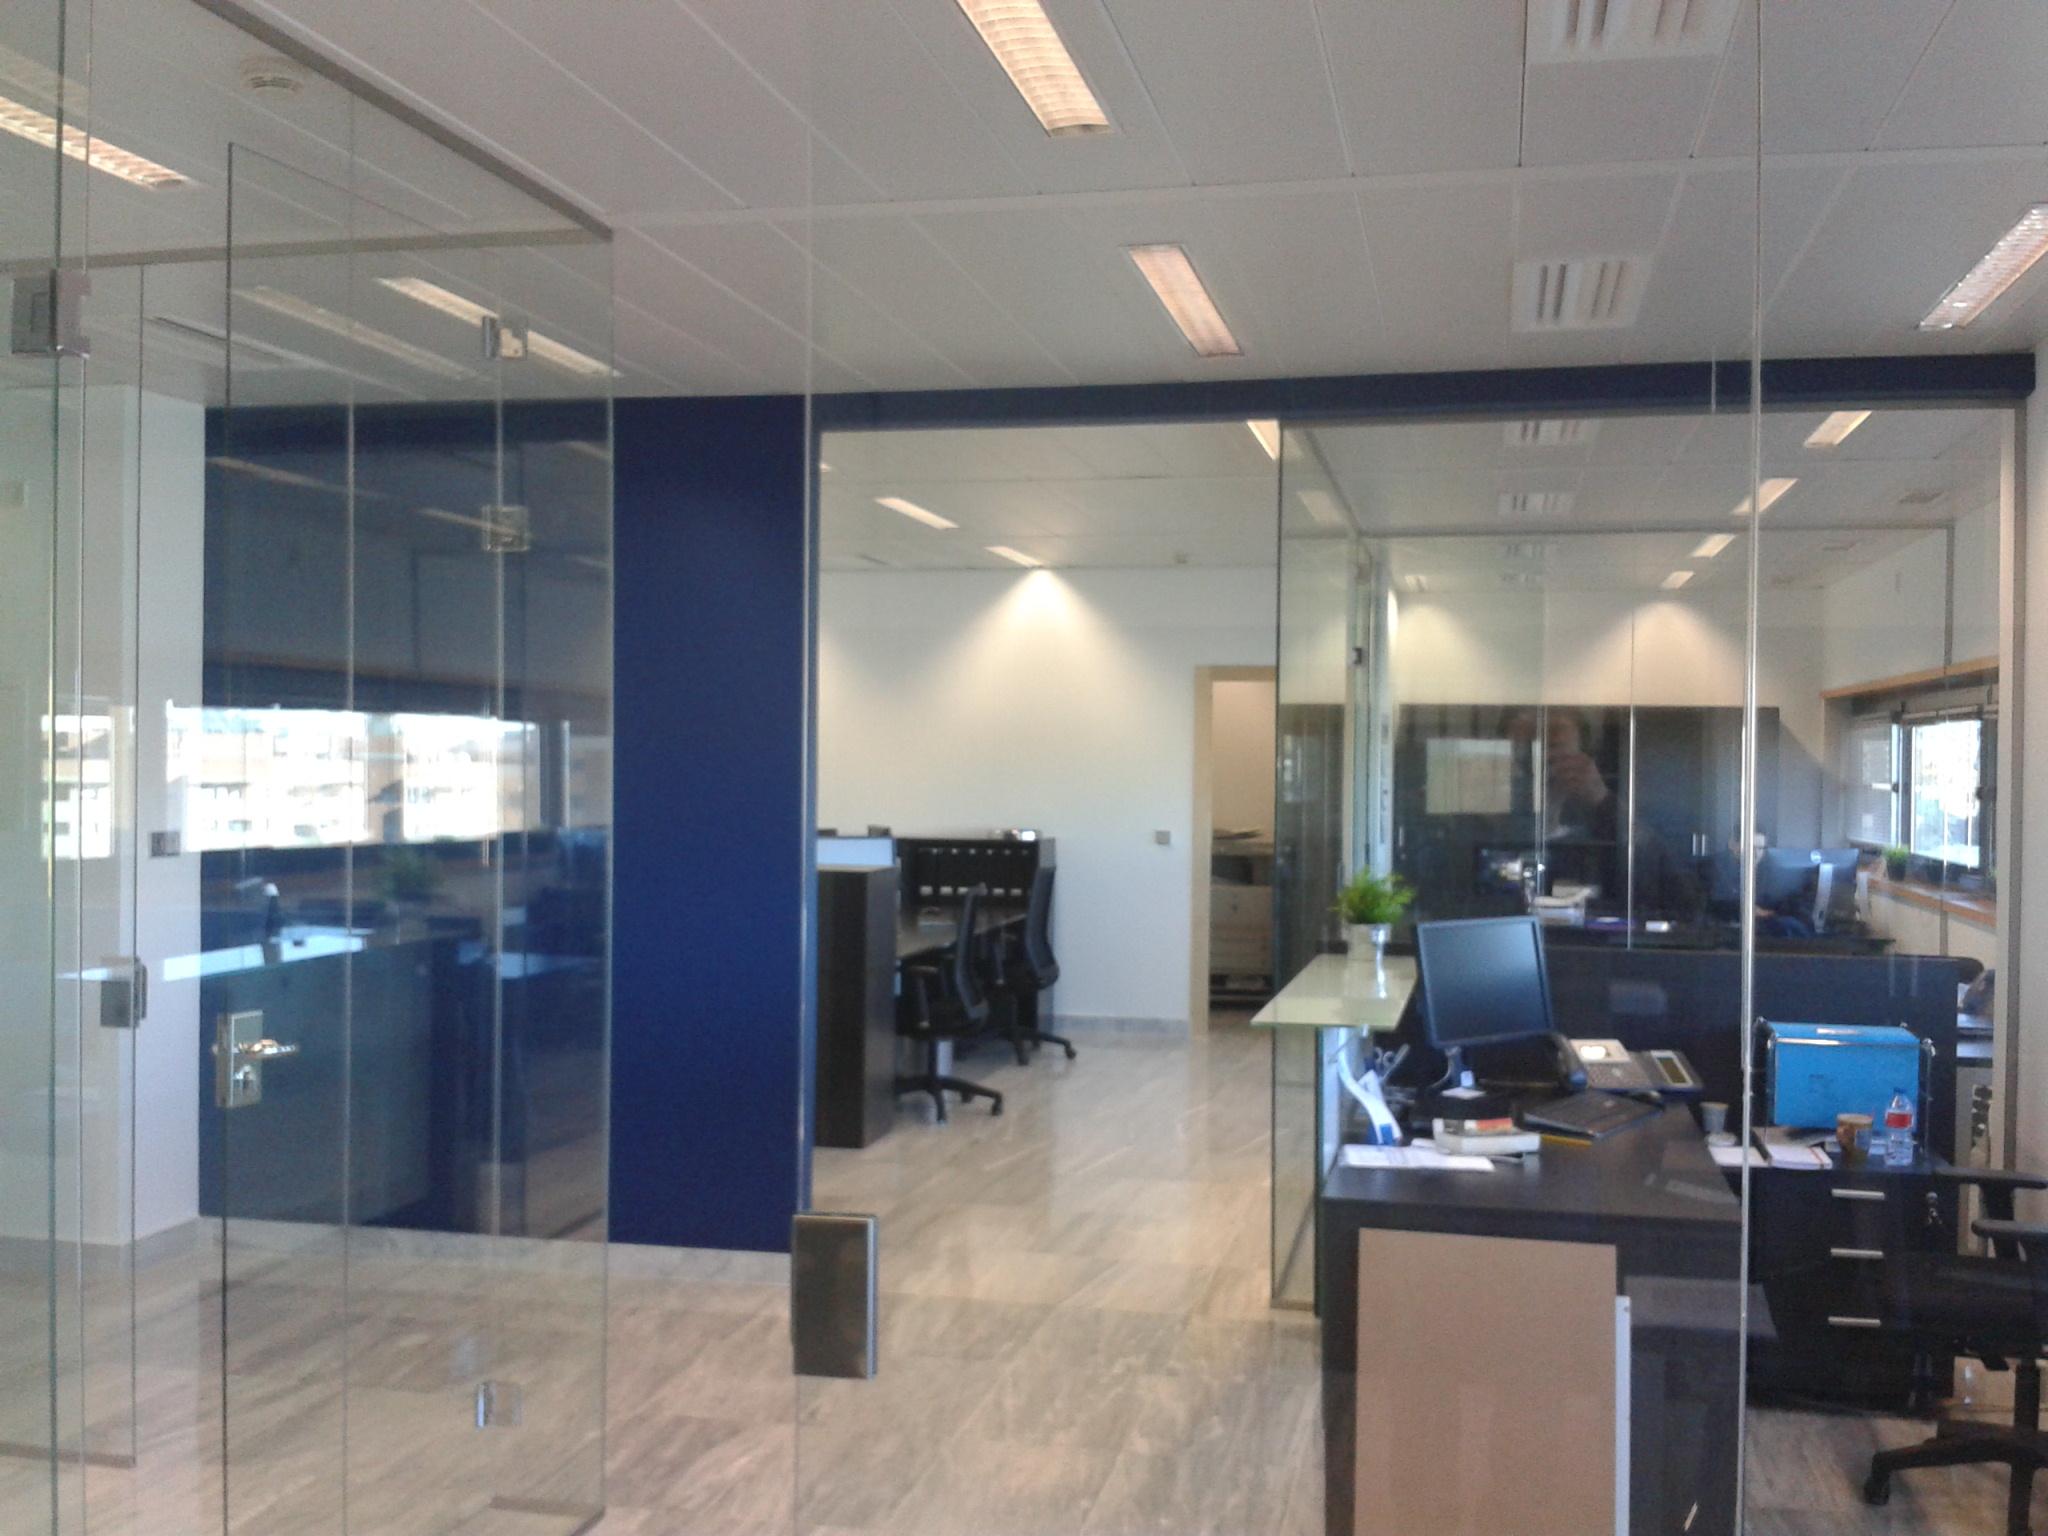 Obra oficinas steag sevilla sevilla reforma asesoria tecnica de la construcci n sevilla - Oficina de obra ...